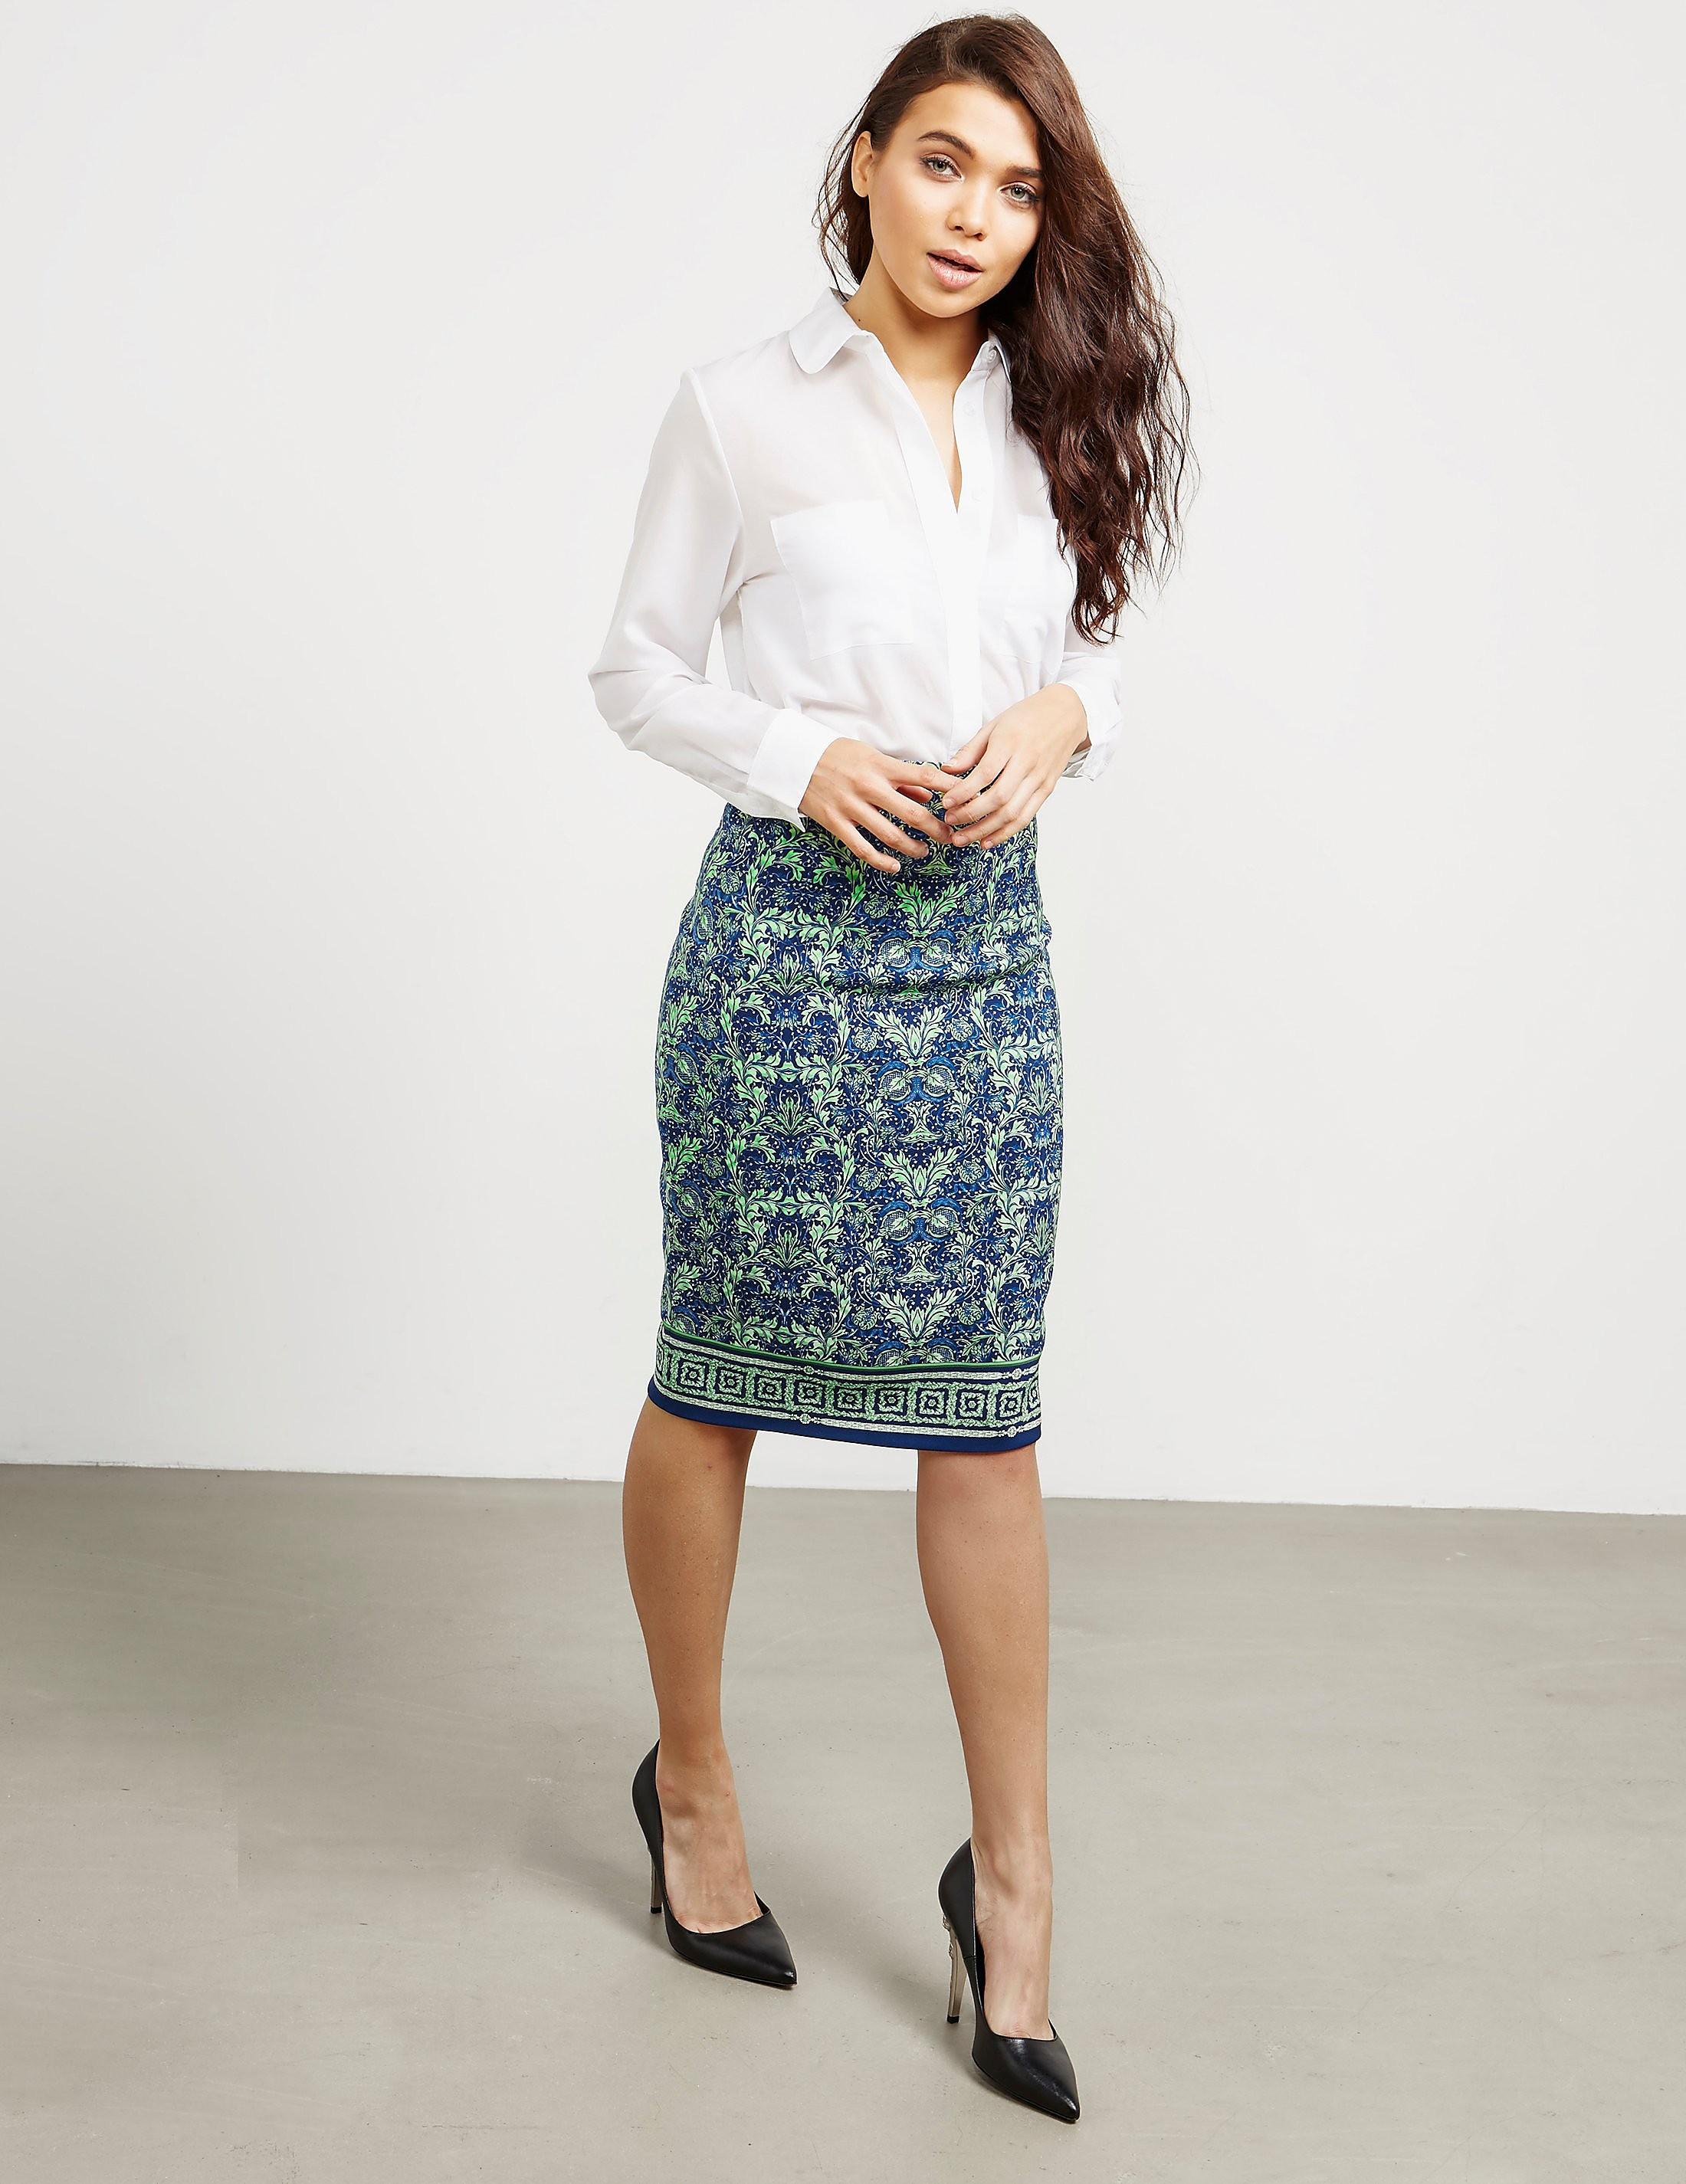 Versace Printed Skirt